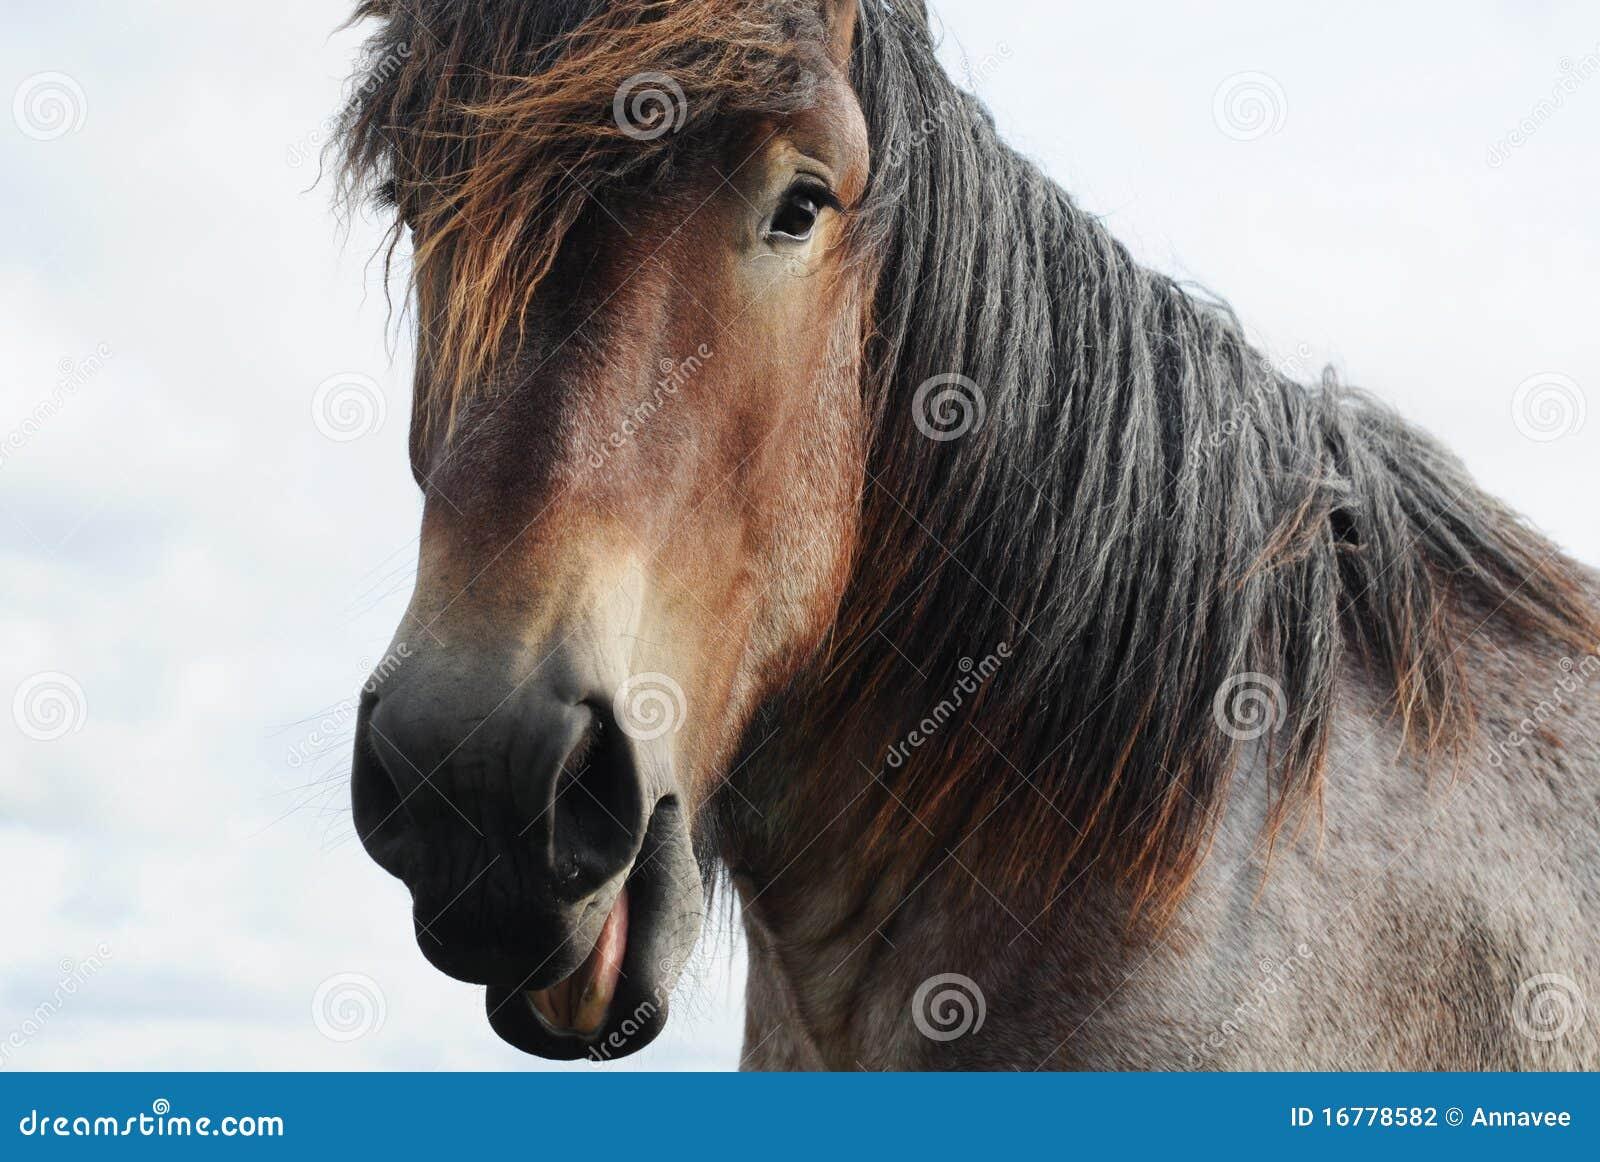 draft horse head profile